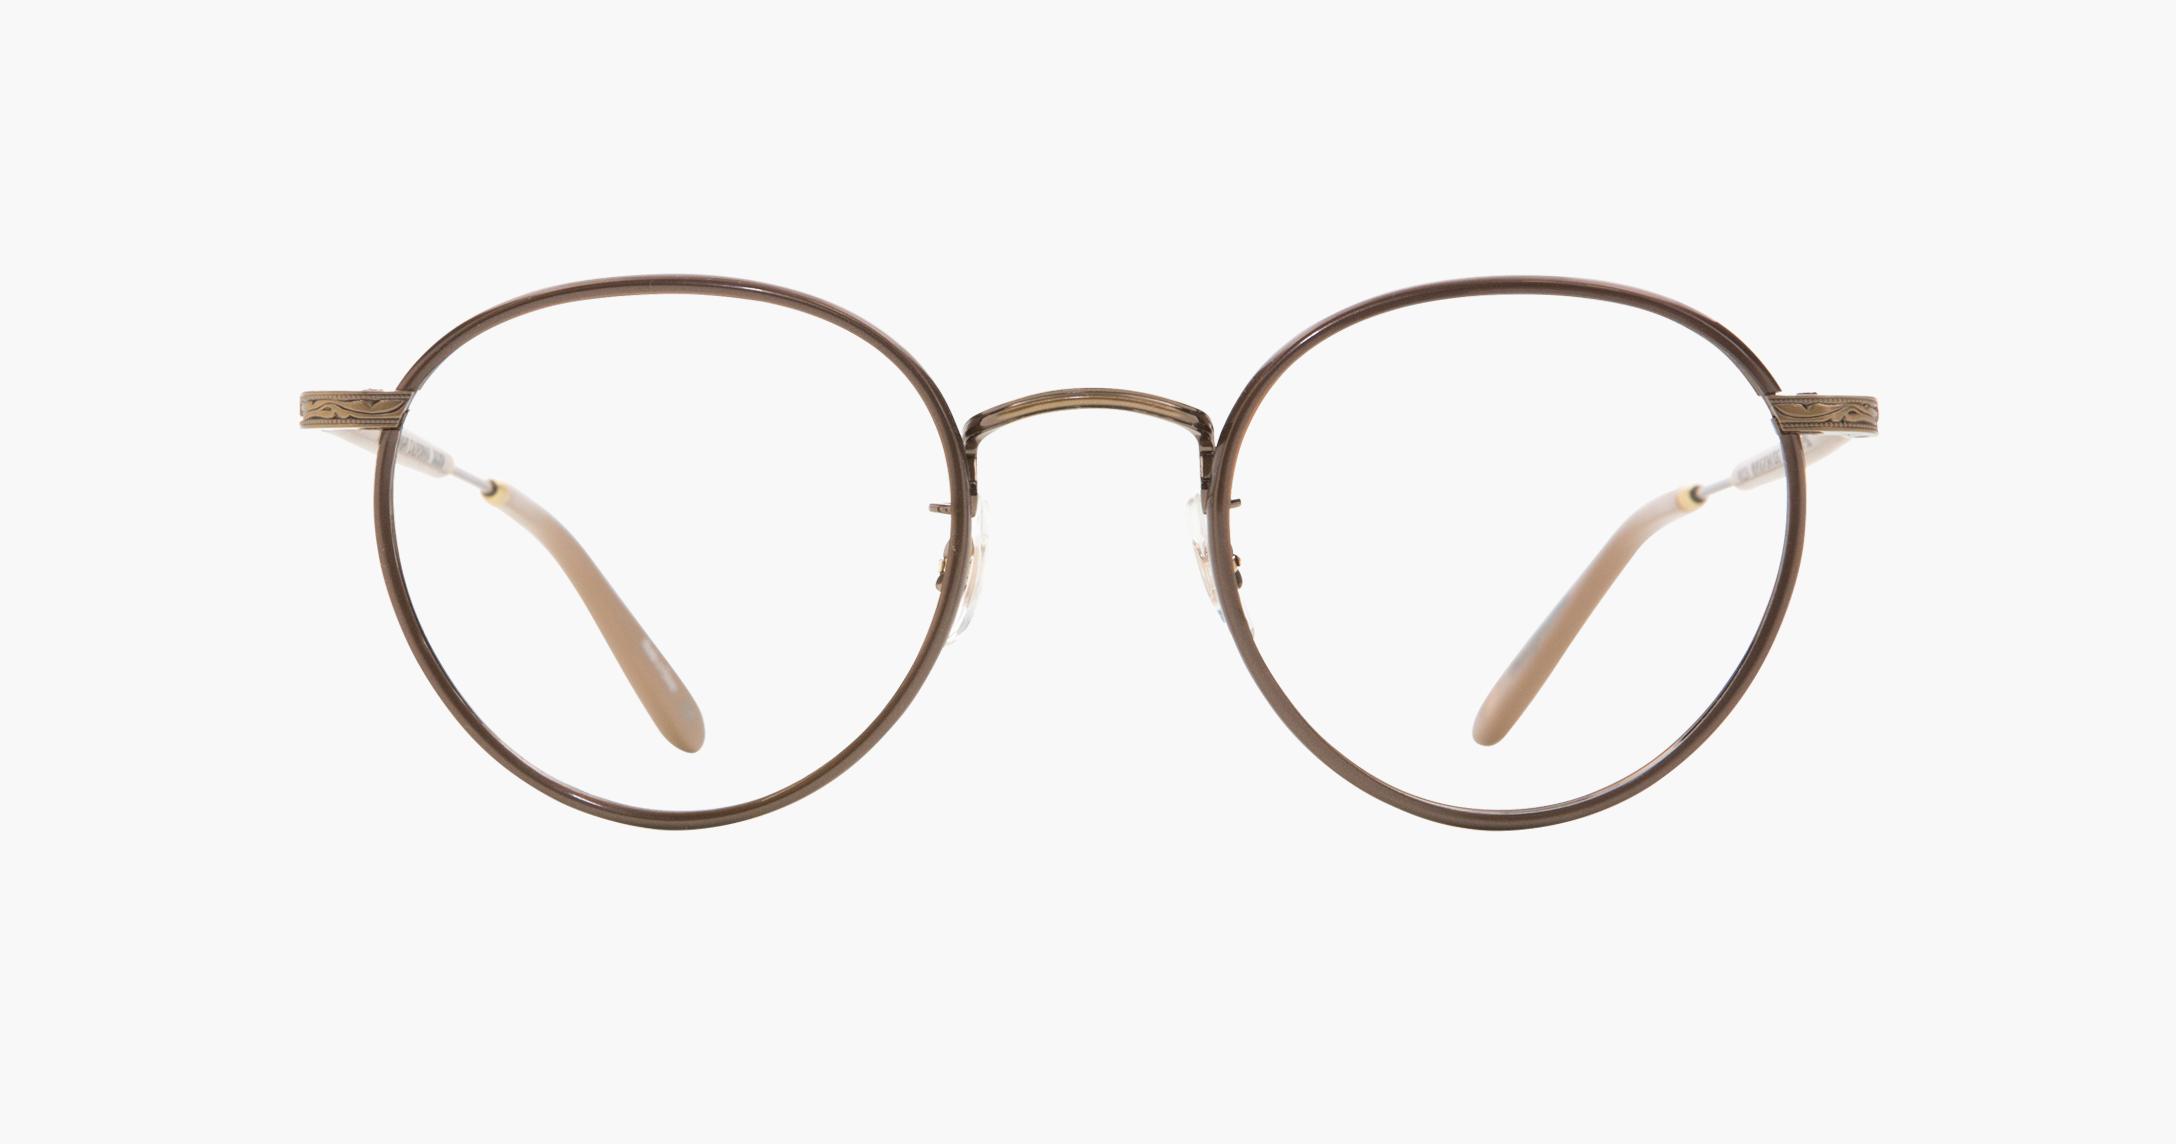 Wilson Round Glasses Men Round Eyeglasses Frames Eyeglasses